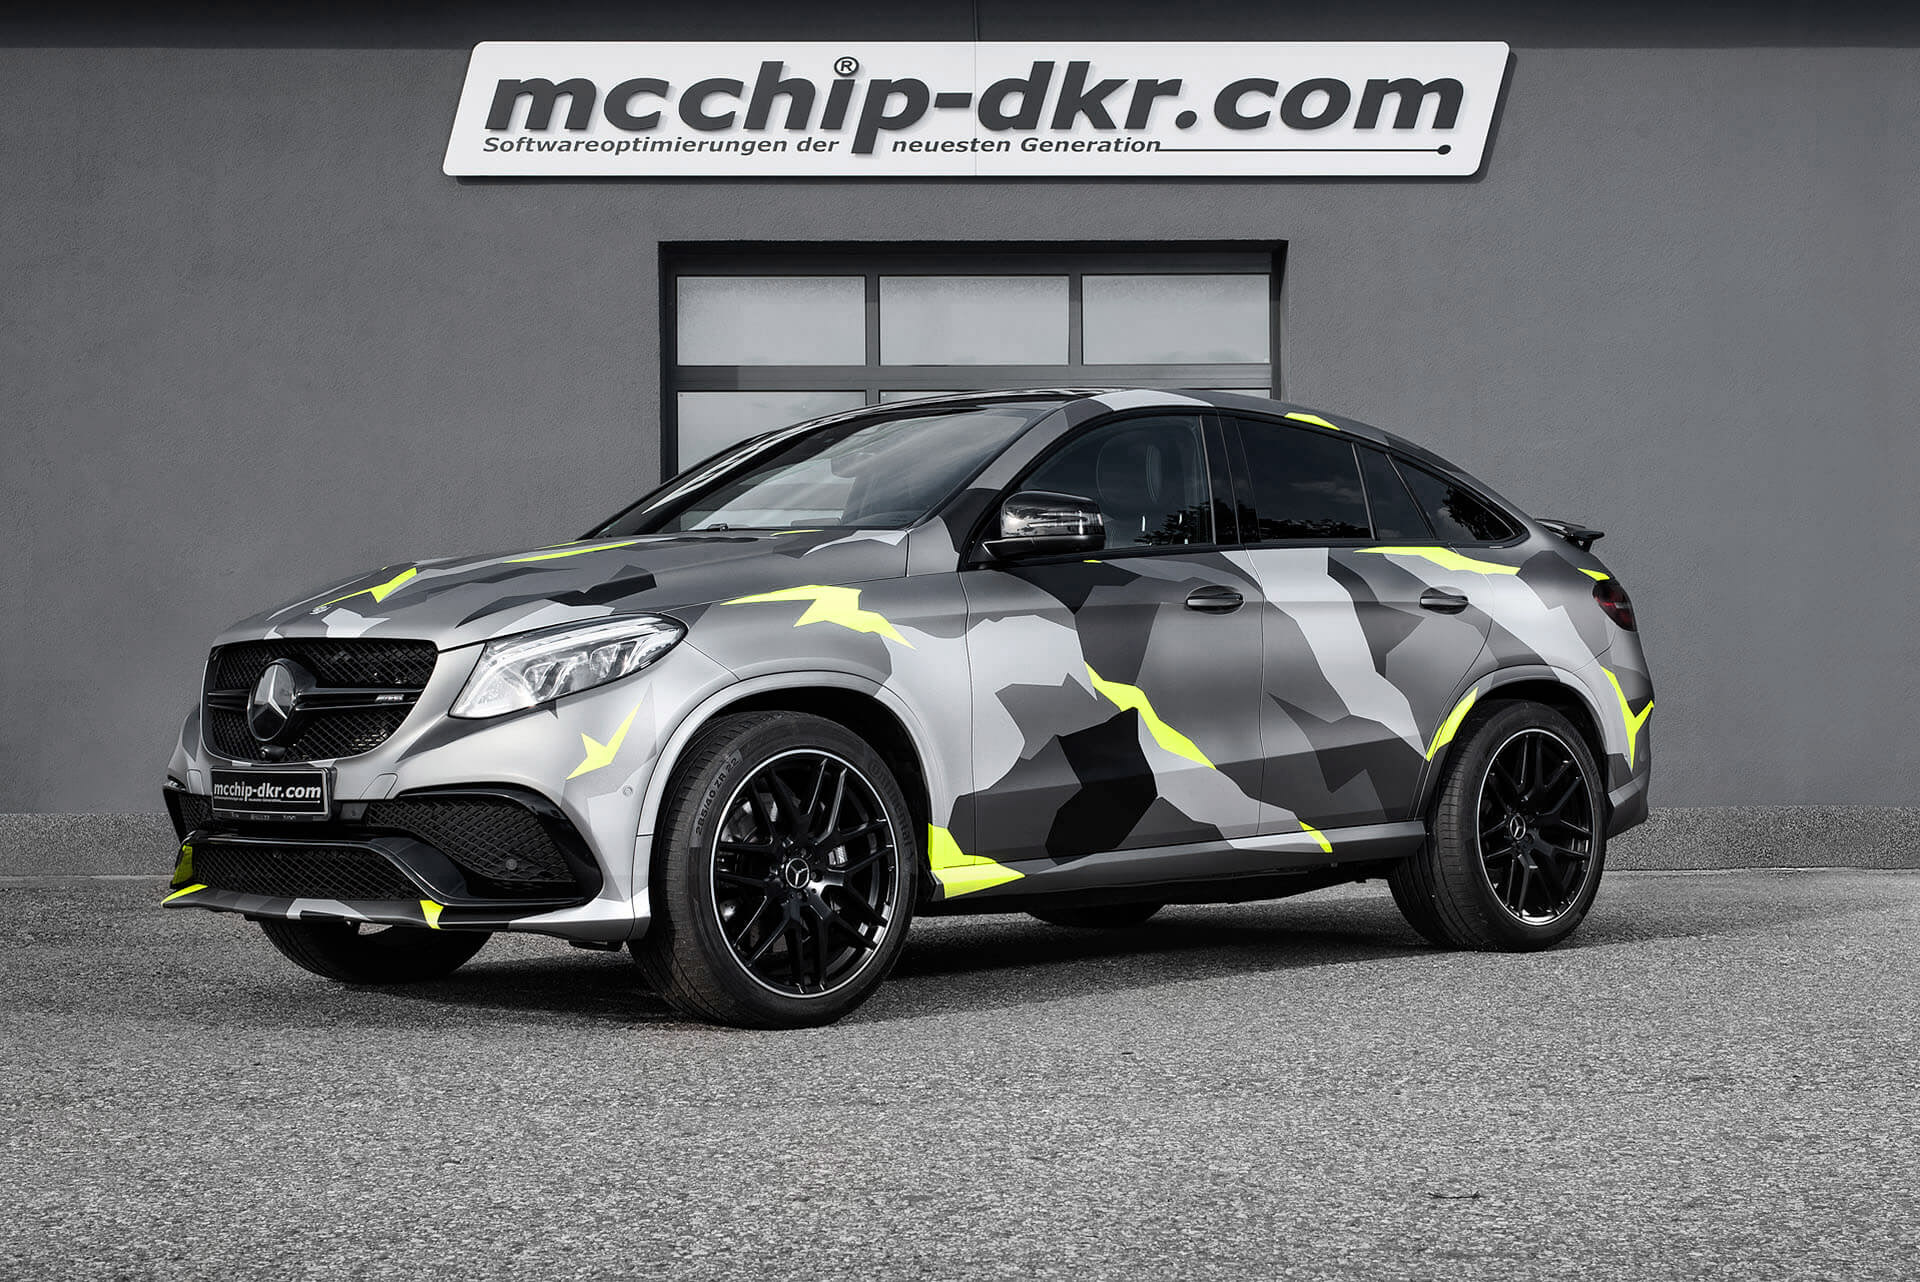 C63 Amg Coupe 2018 >> Mercedes-AMG GLE 63 Coupé MC900